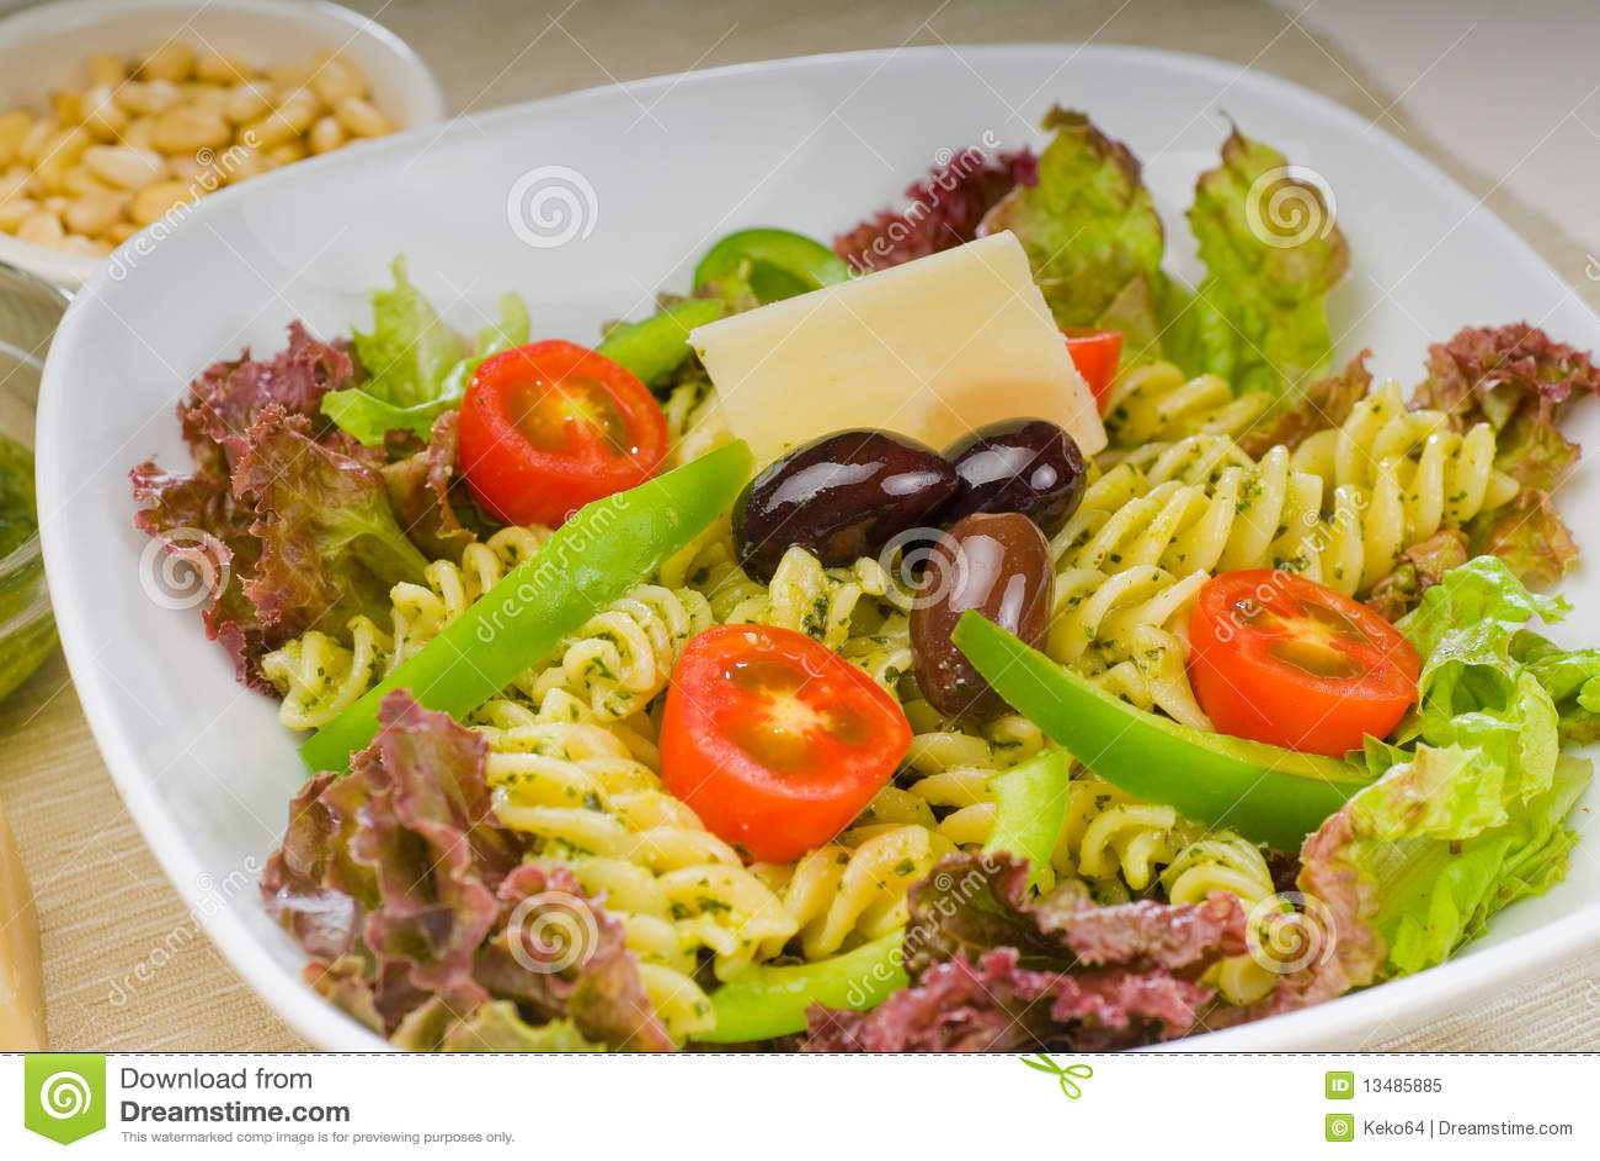 Ensalada de pastas italiana del fusilli foto de archivo - Ensalada fresca de pasta ...